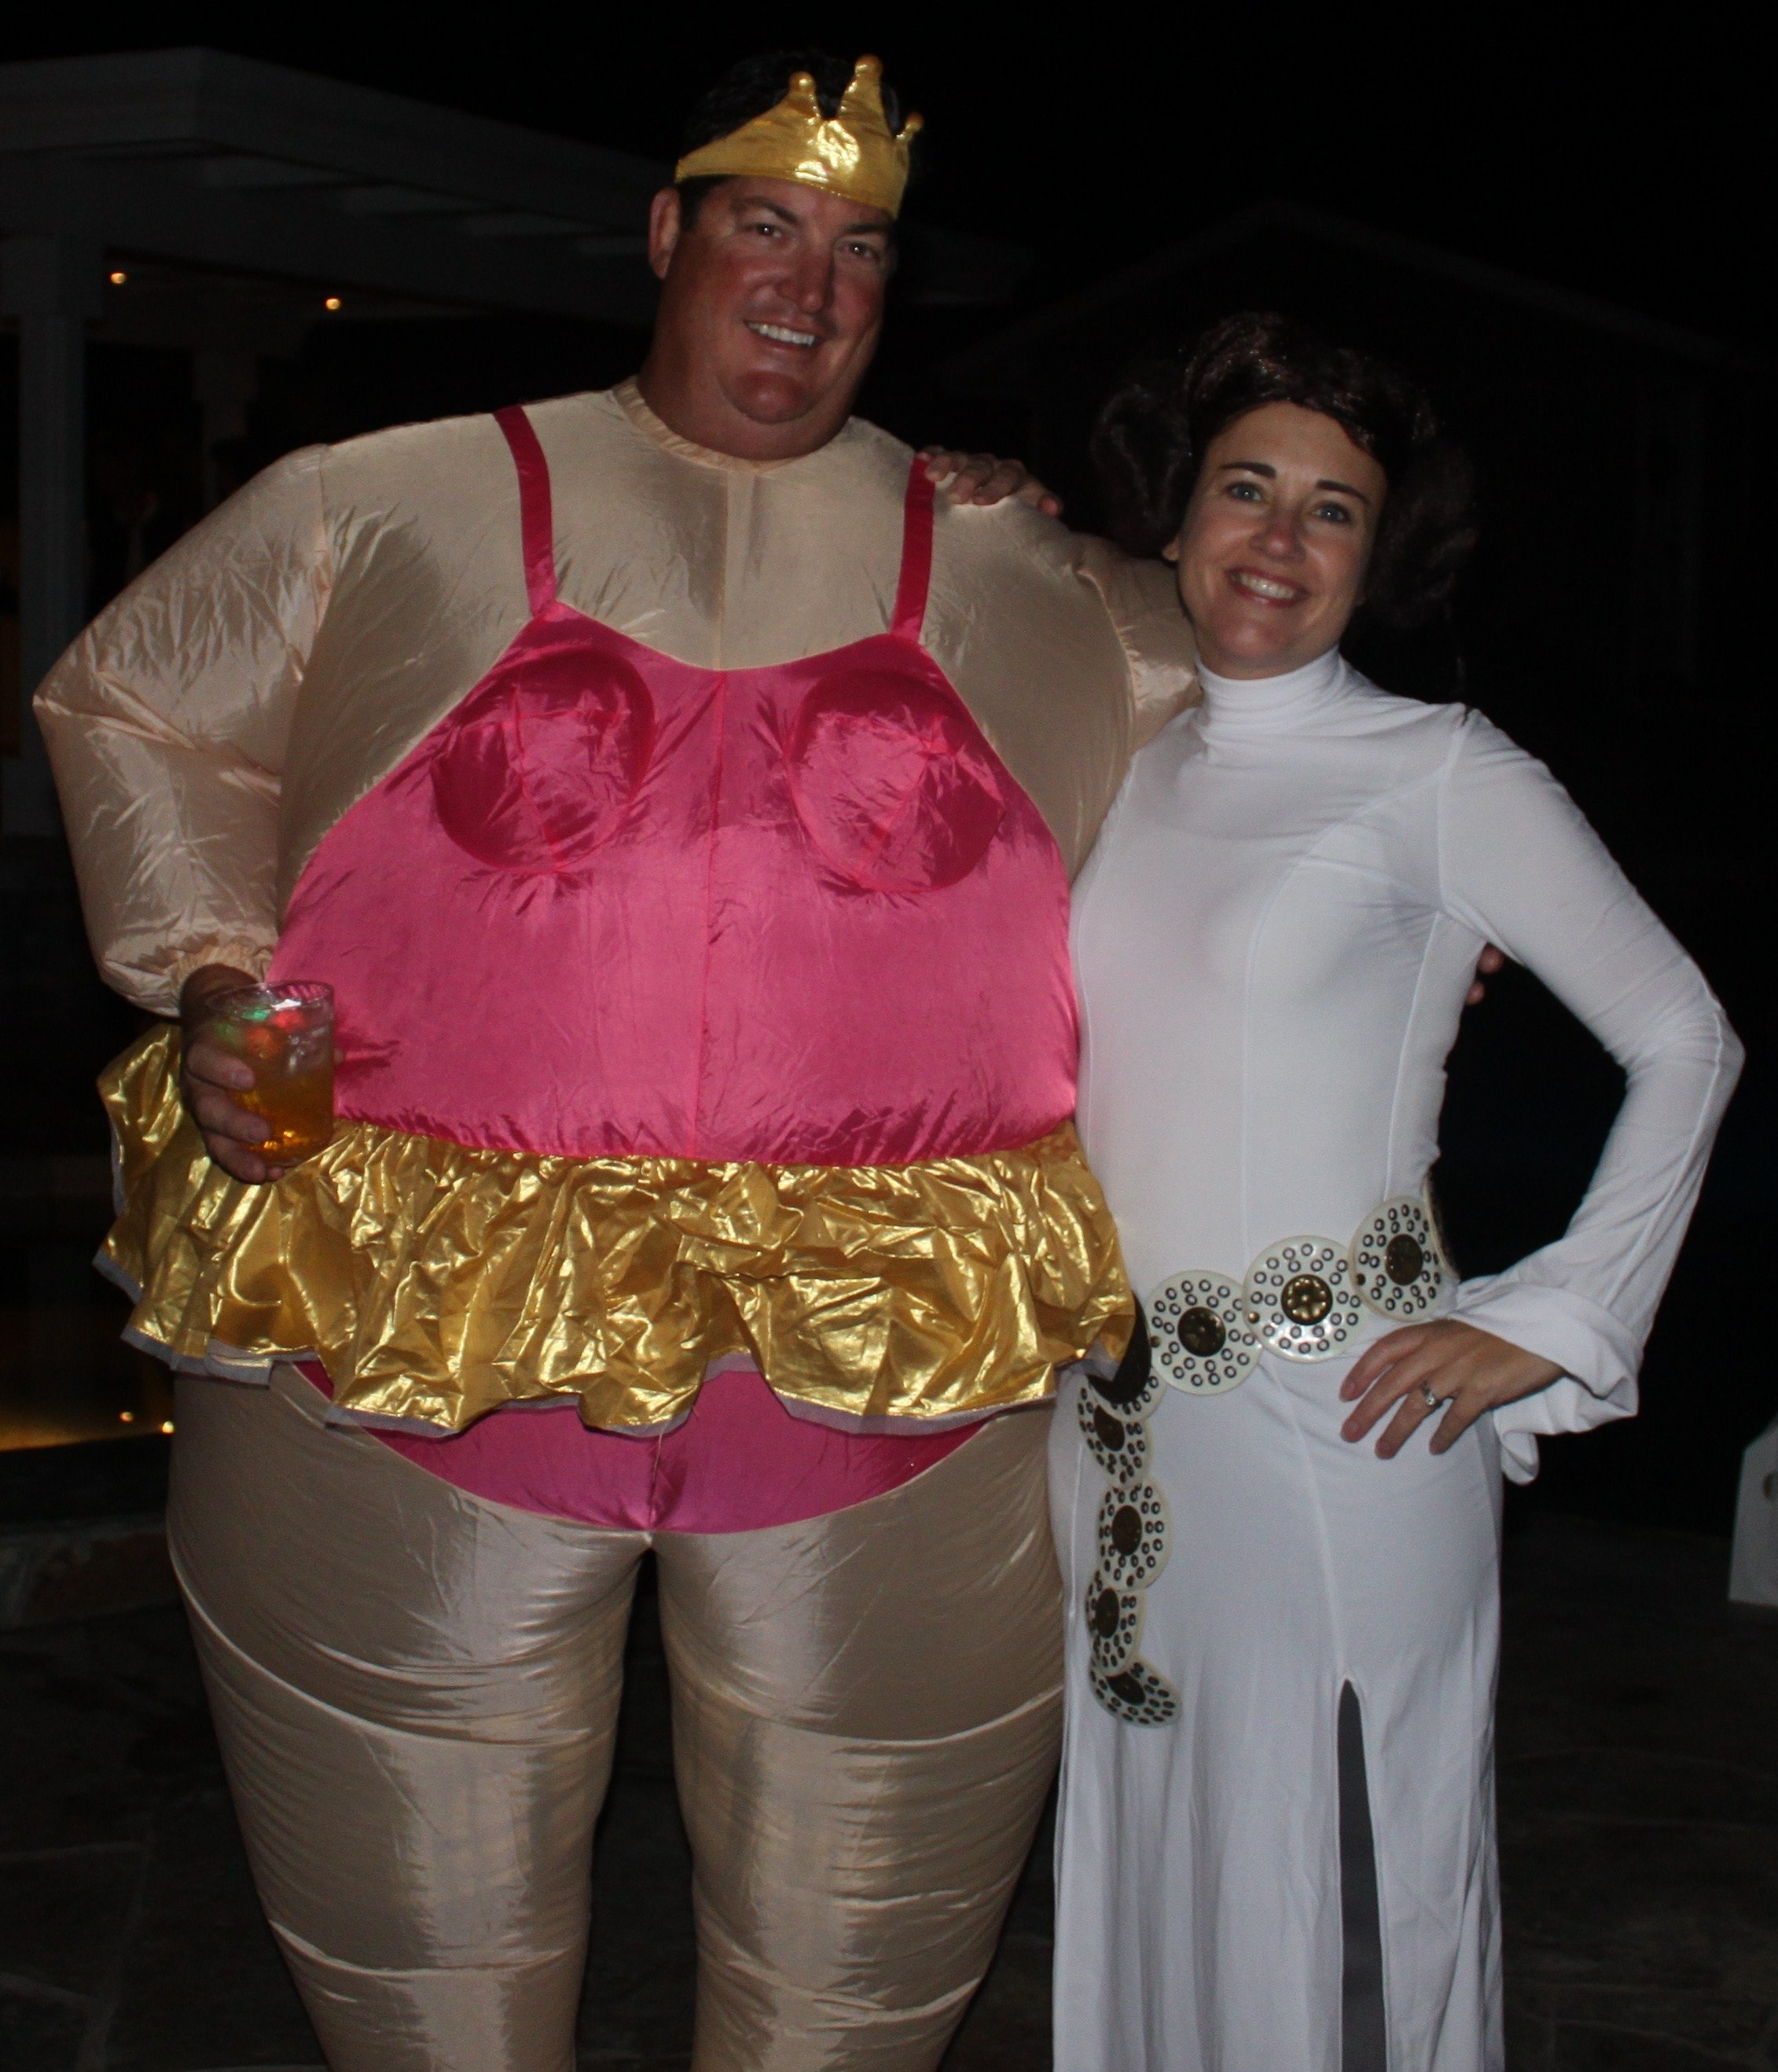 10 Elegant Costume Ideas For Two People halloween costume ideas 11 2021